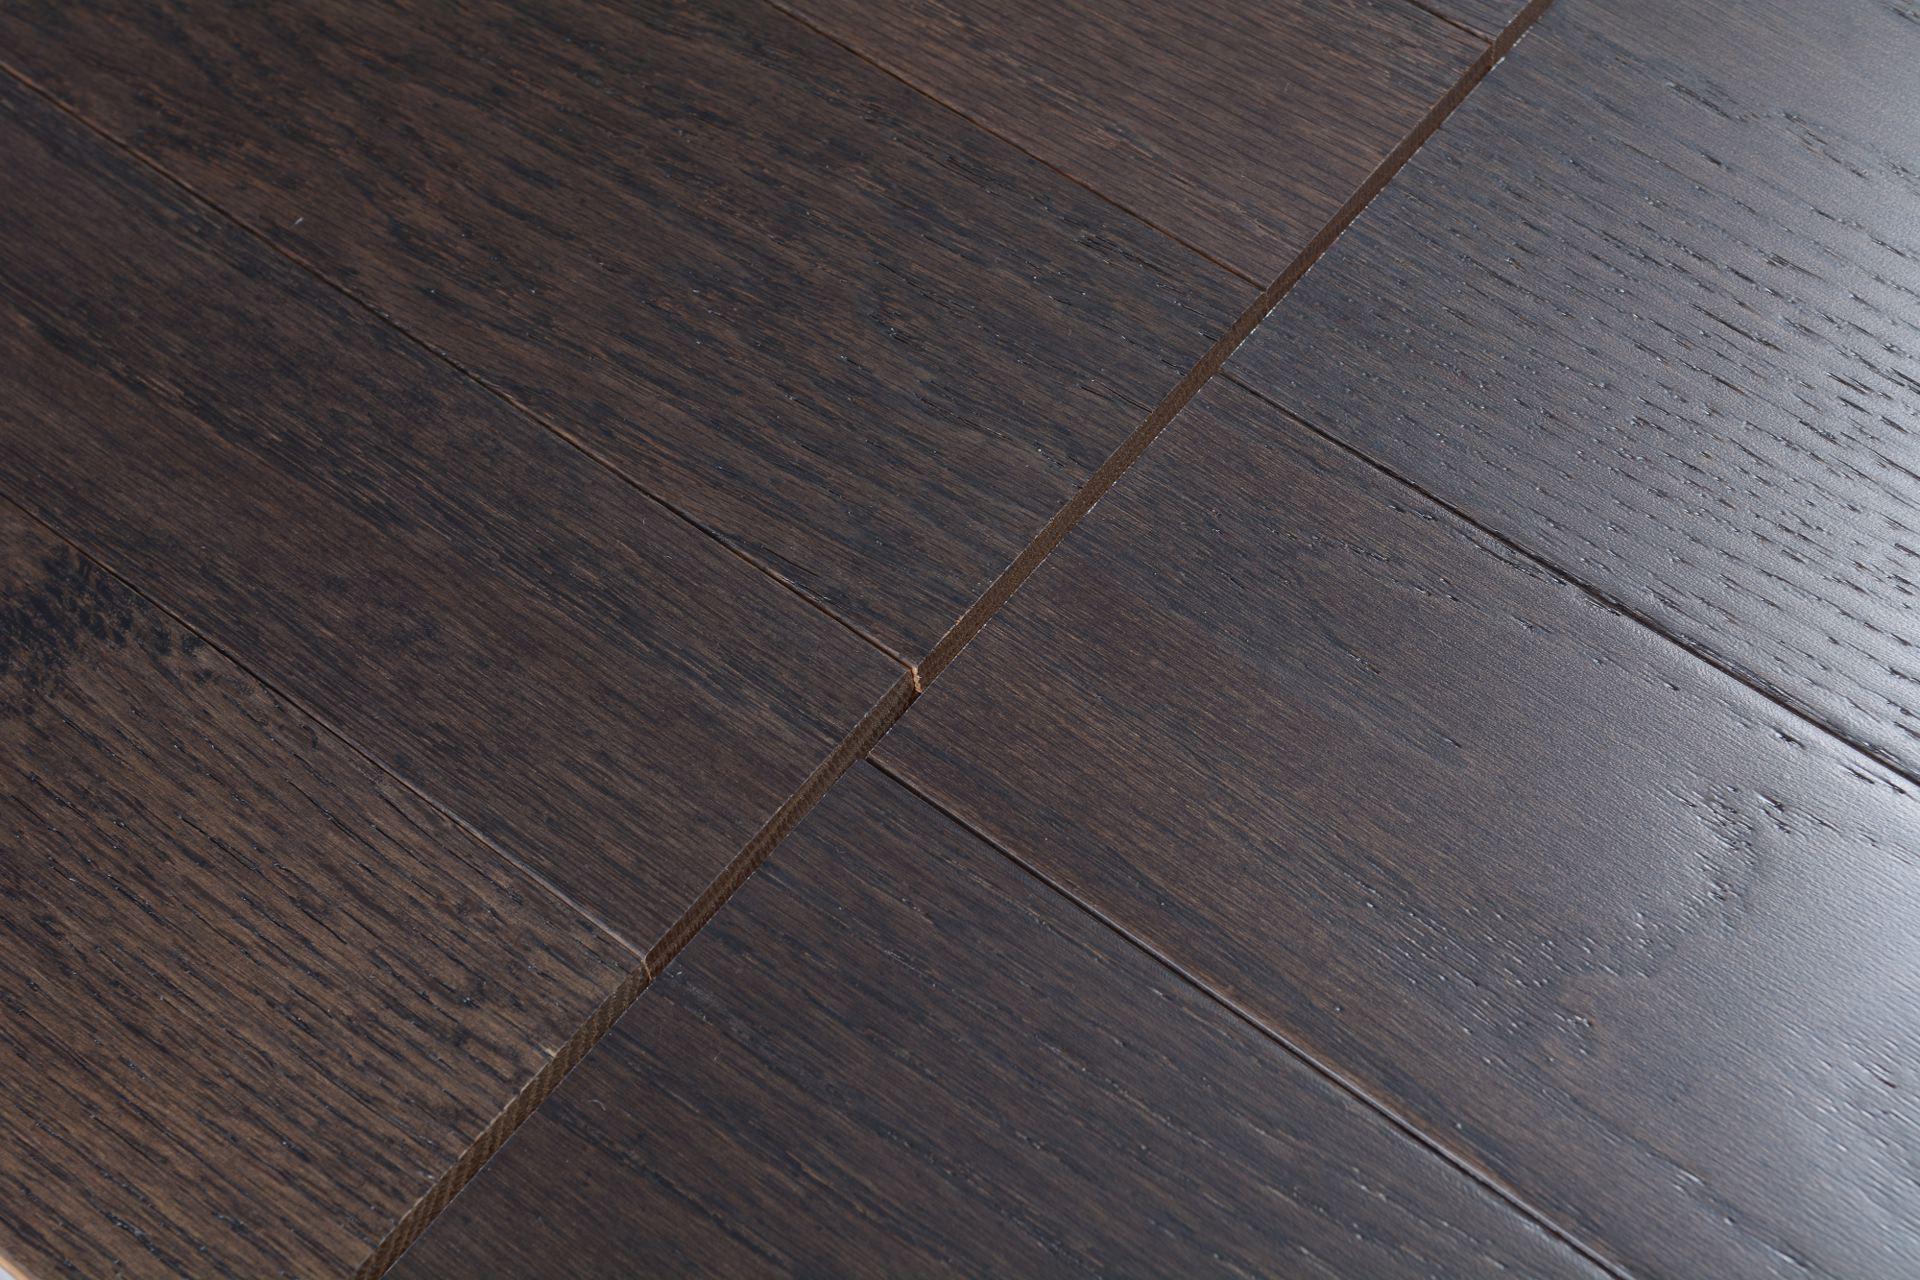 x somerset popular with floor home prefinished engineered white hardwood flooring inspirations reviews design oak stylish